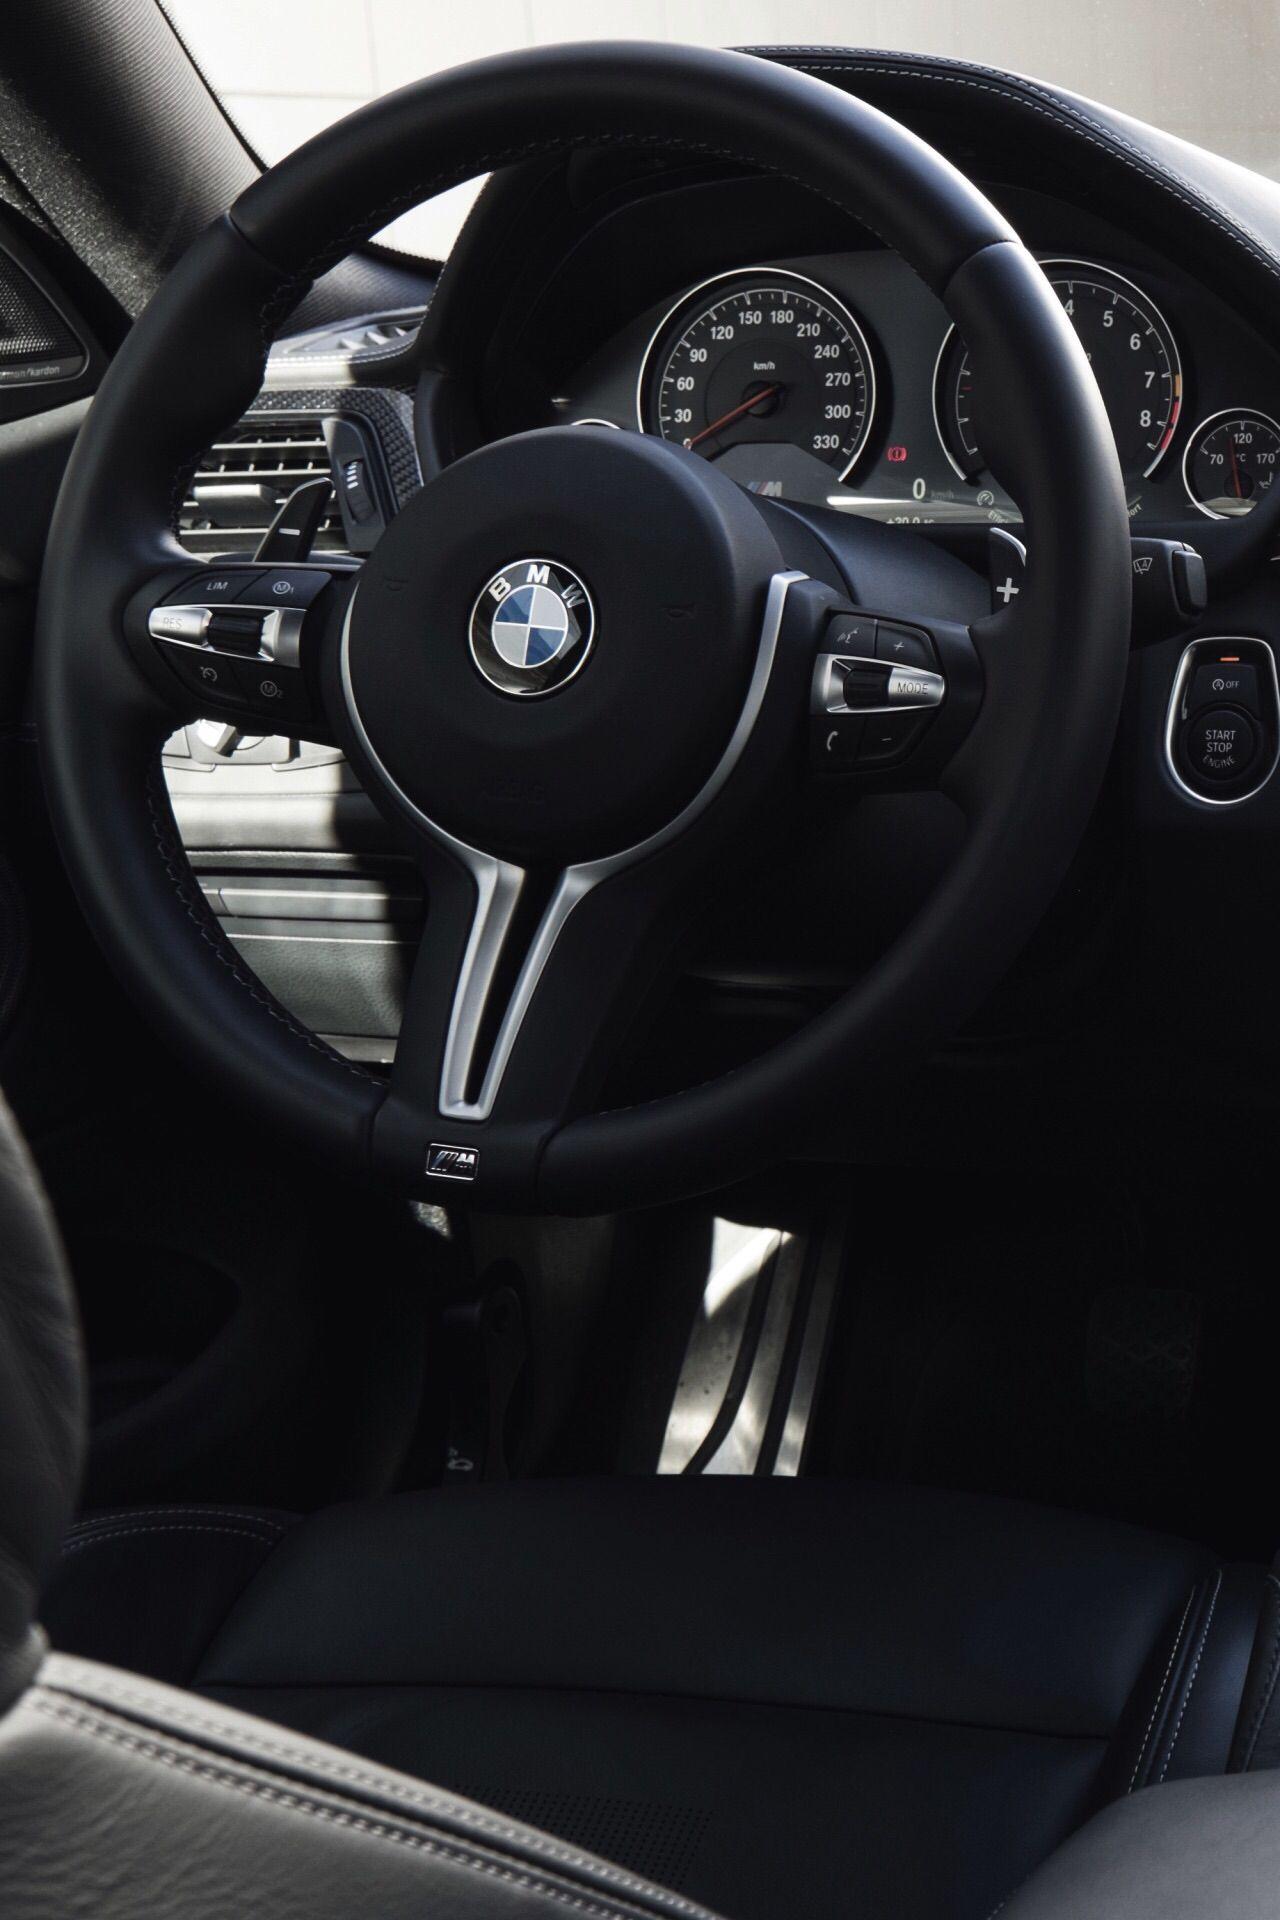 Pin by John Rohwedder on BMW Bmw m4, Bmw m4 interior, Bmw